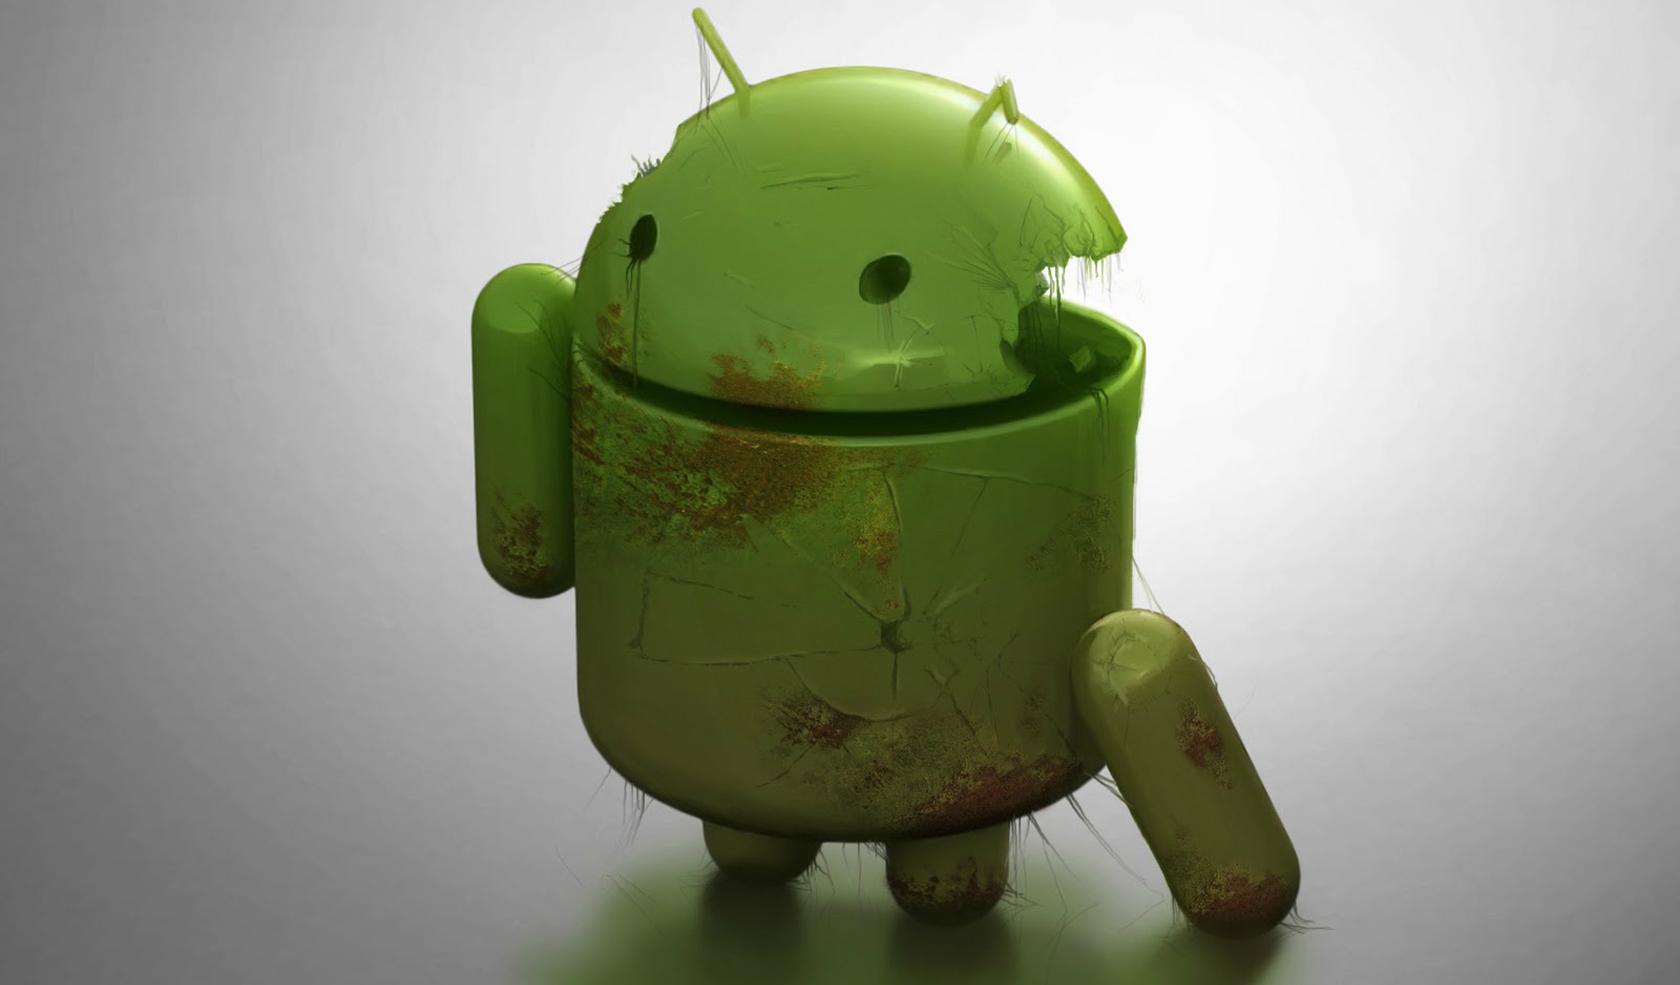 Android-Fallo de seguridad